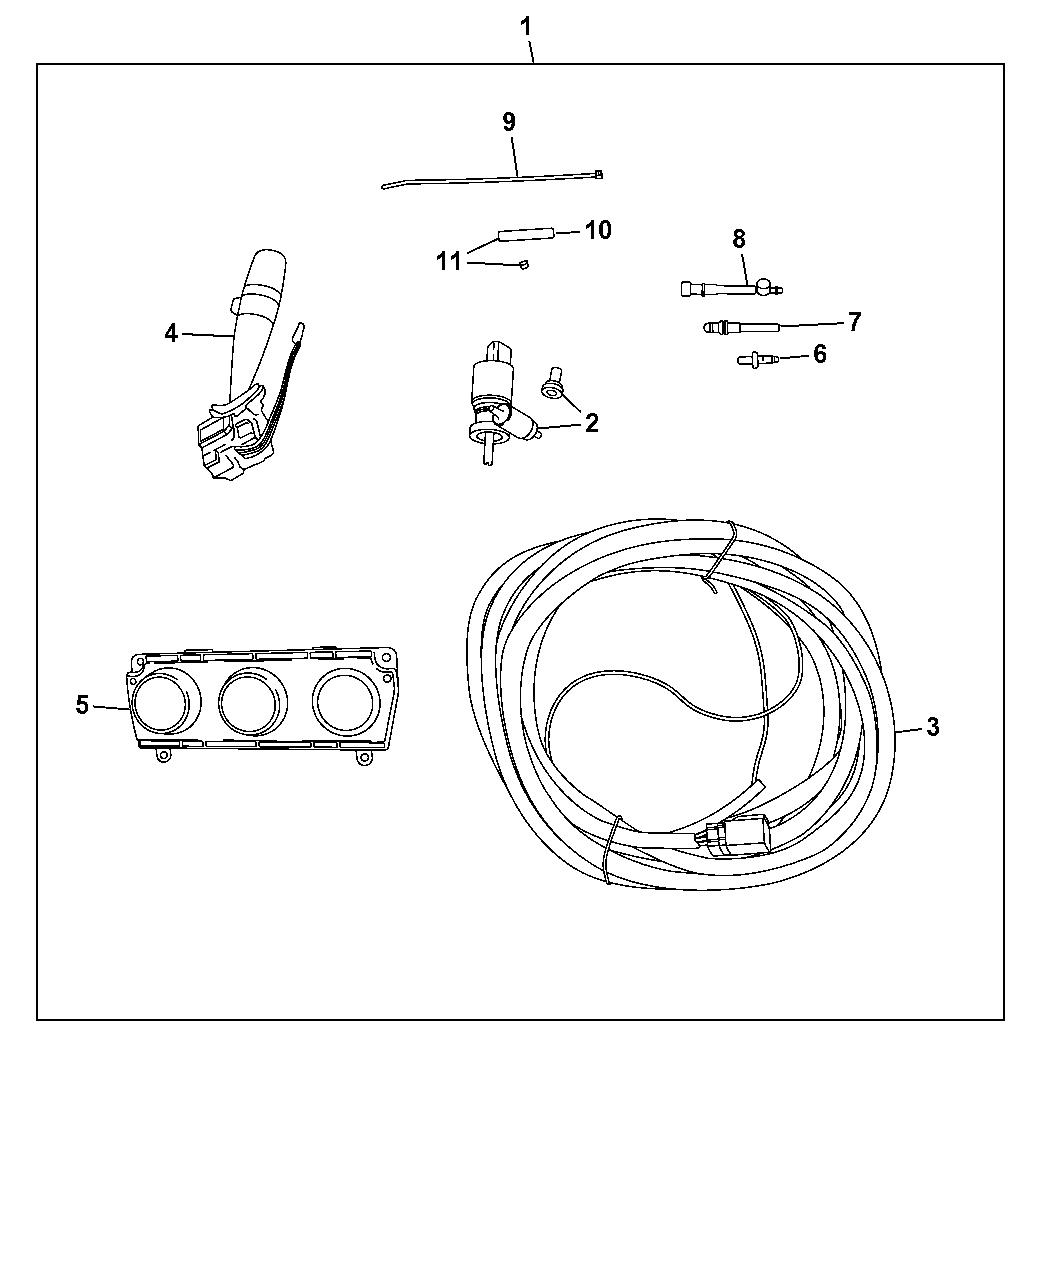 Jeep Tj Hardtop Wiring Kit - Wiring Diagram Schemas